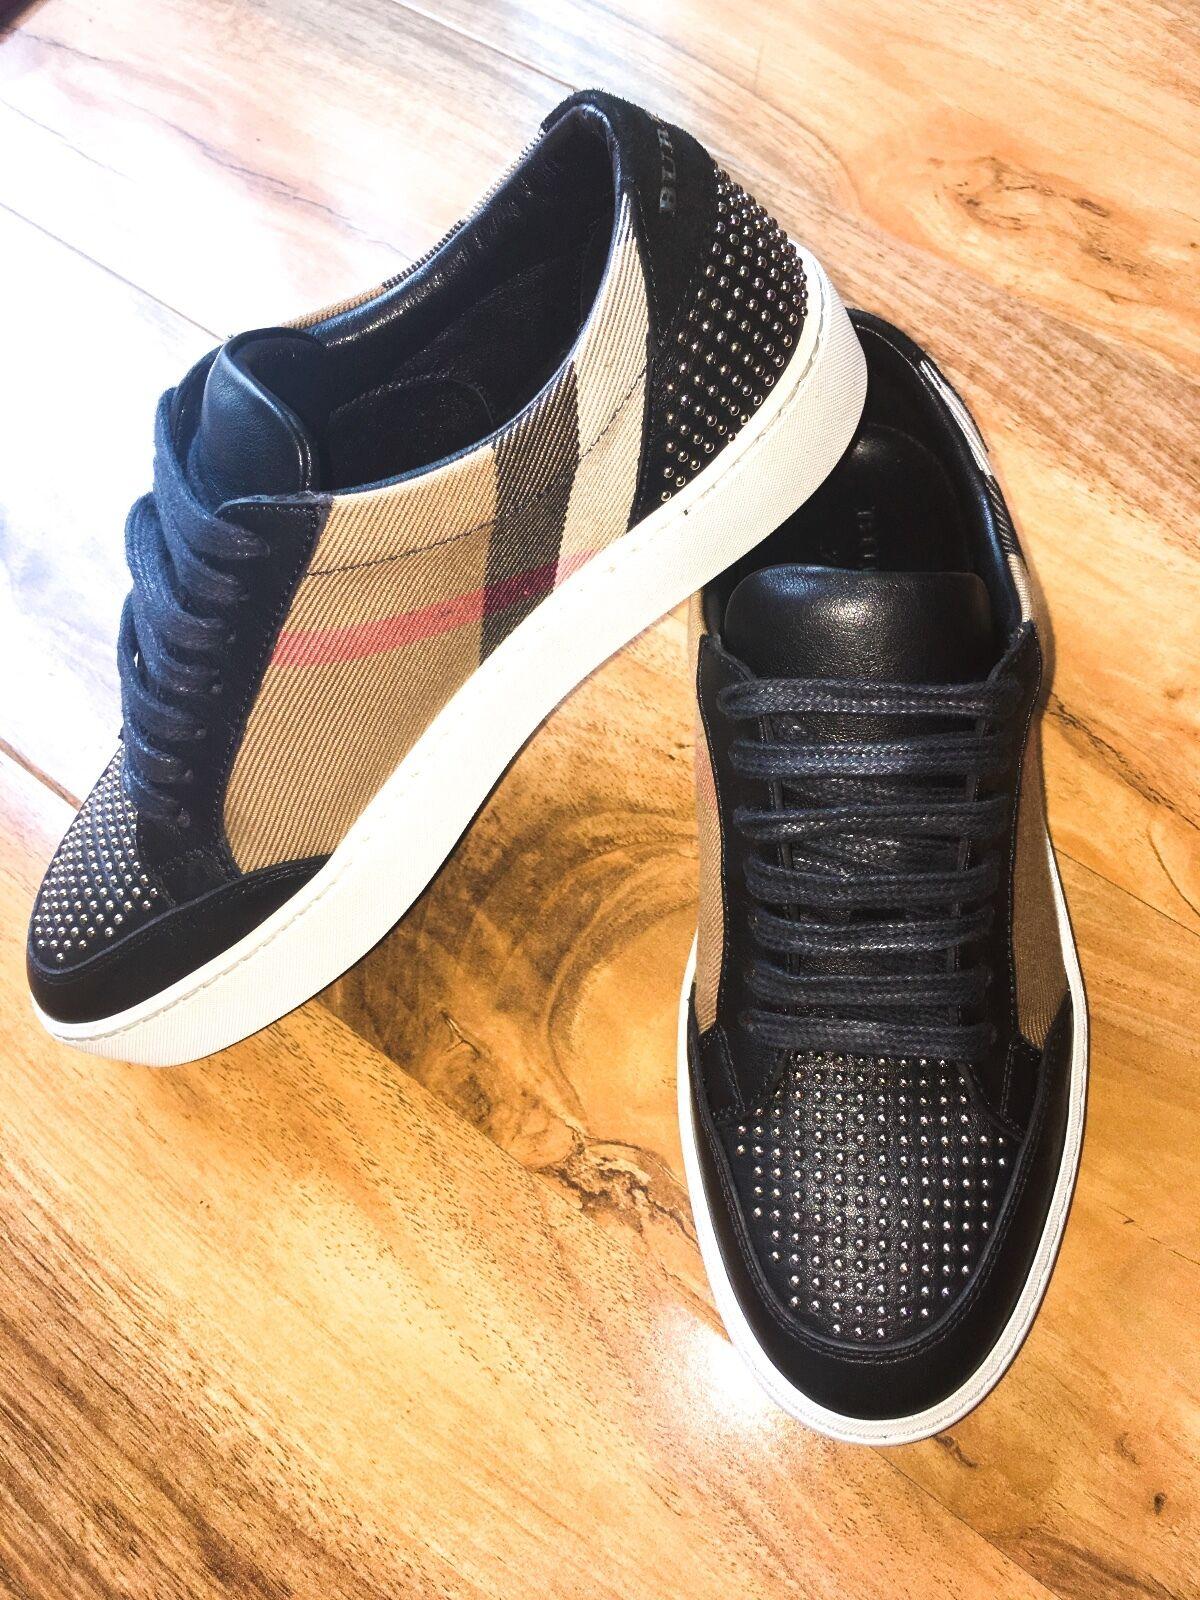 Totalmente nuevo para mujeres Burberry LOW TOP zapatillas con tachuelas tachuelas tachuelas euro 35 UK 2 3 0b13aa